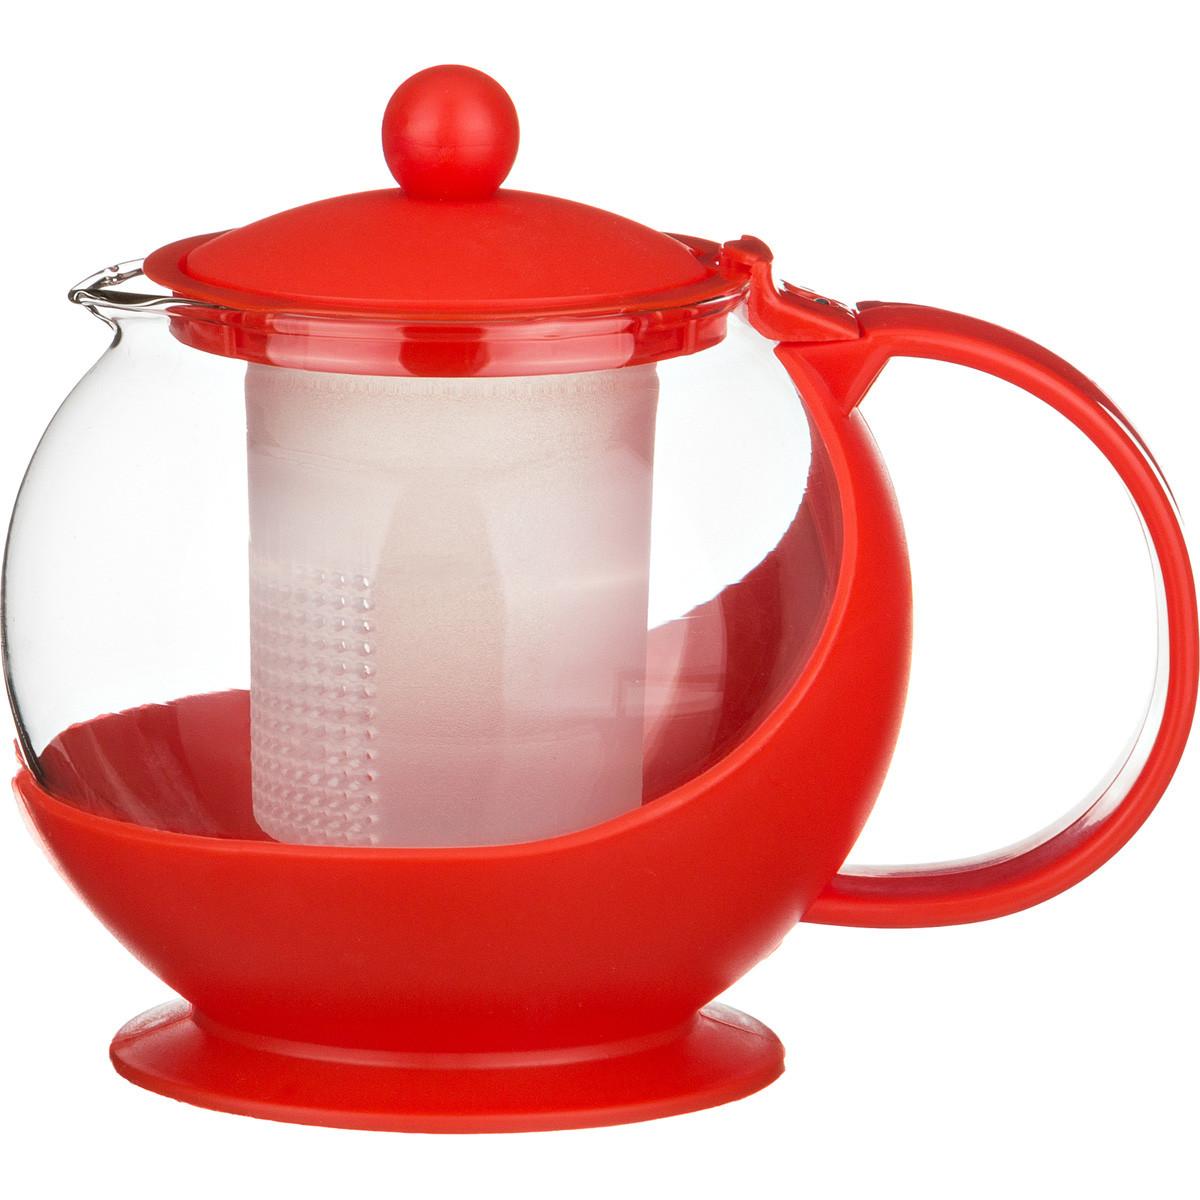 {} Agness Сервиз Trussardi  (1250 мл) чайник 1250 мл цв уп 1140366